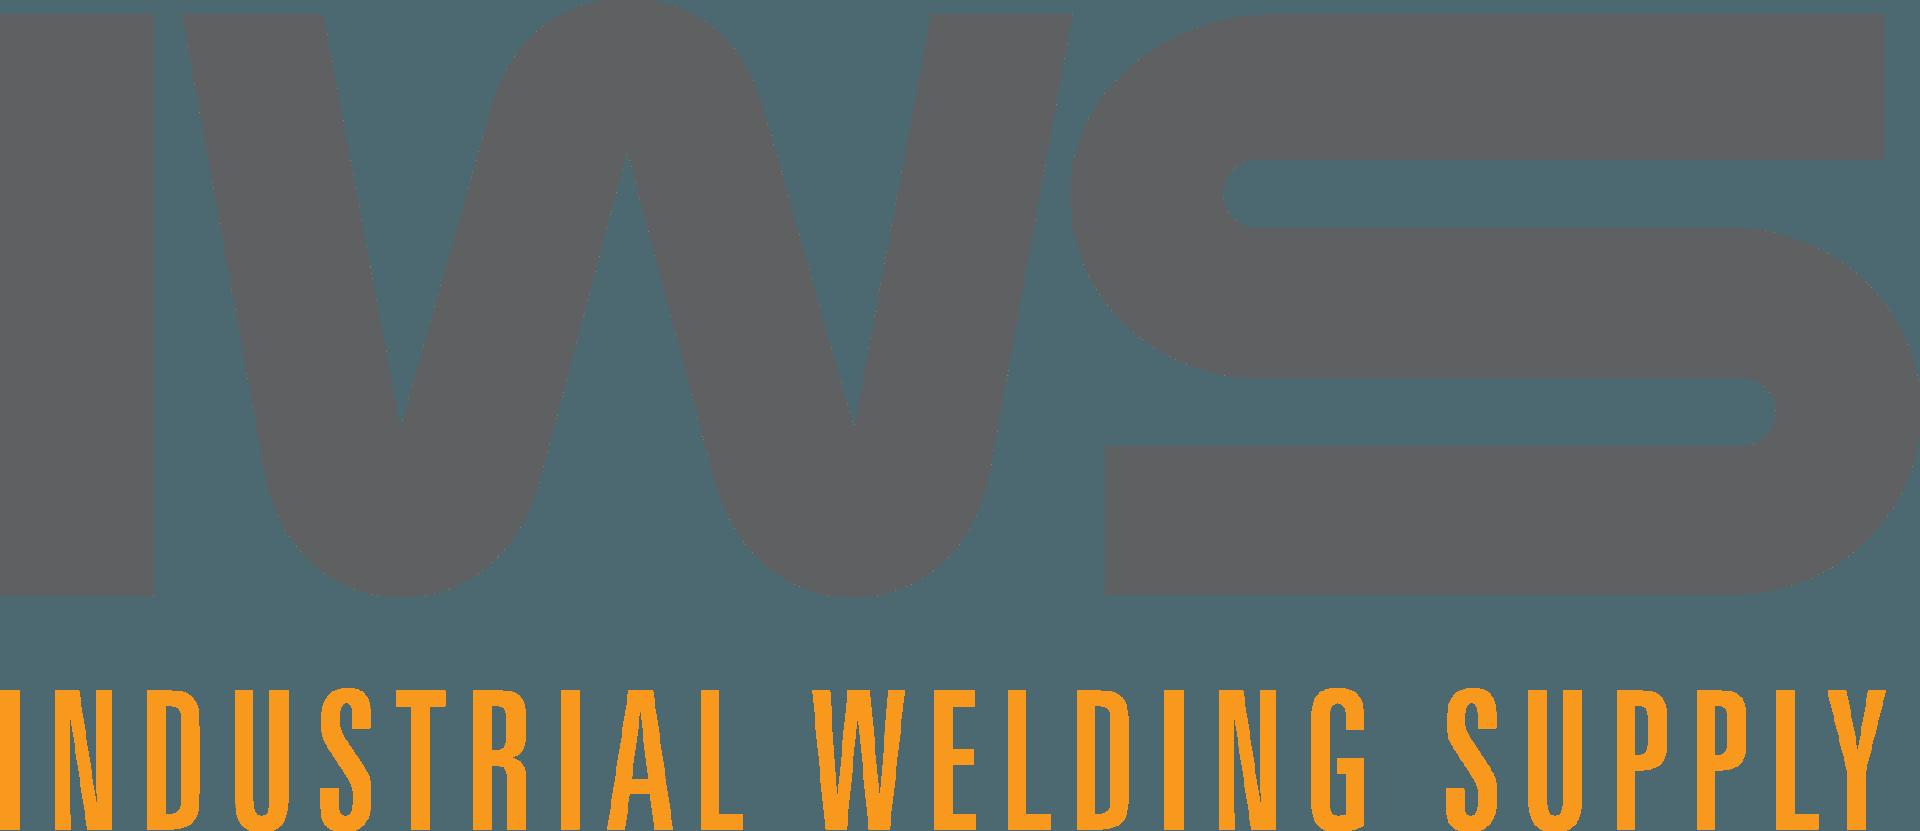 Industrial Welding Supply Welding Materials And Supplies In